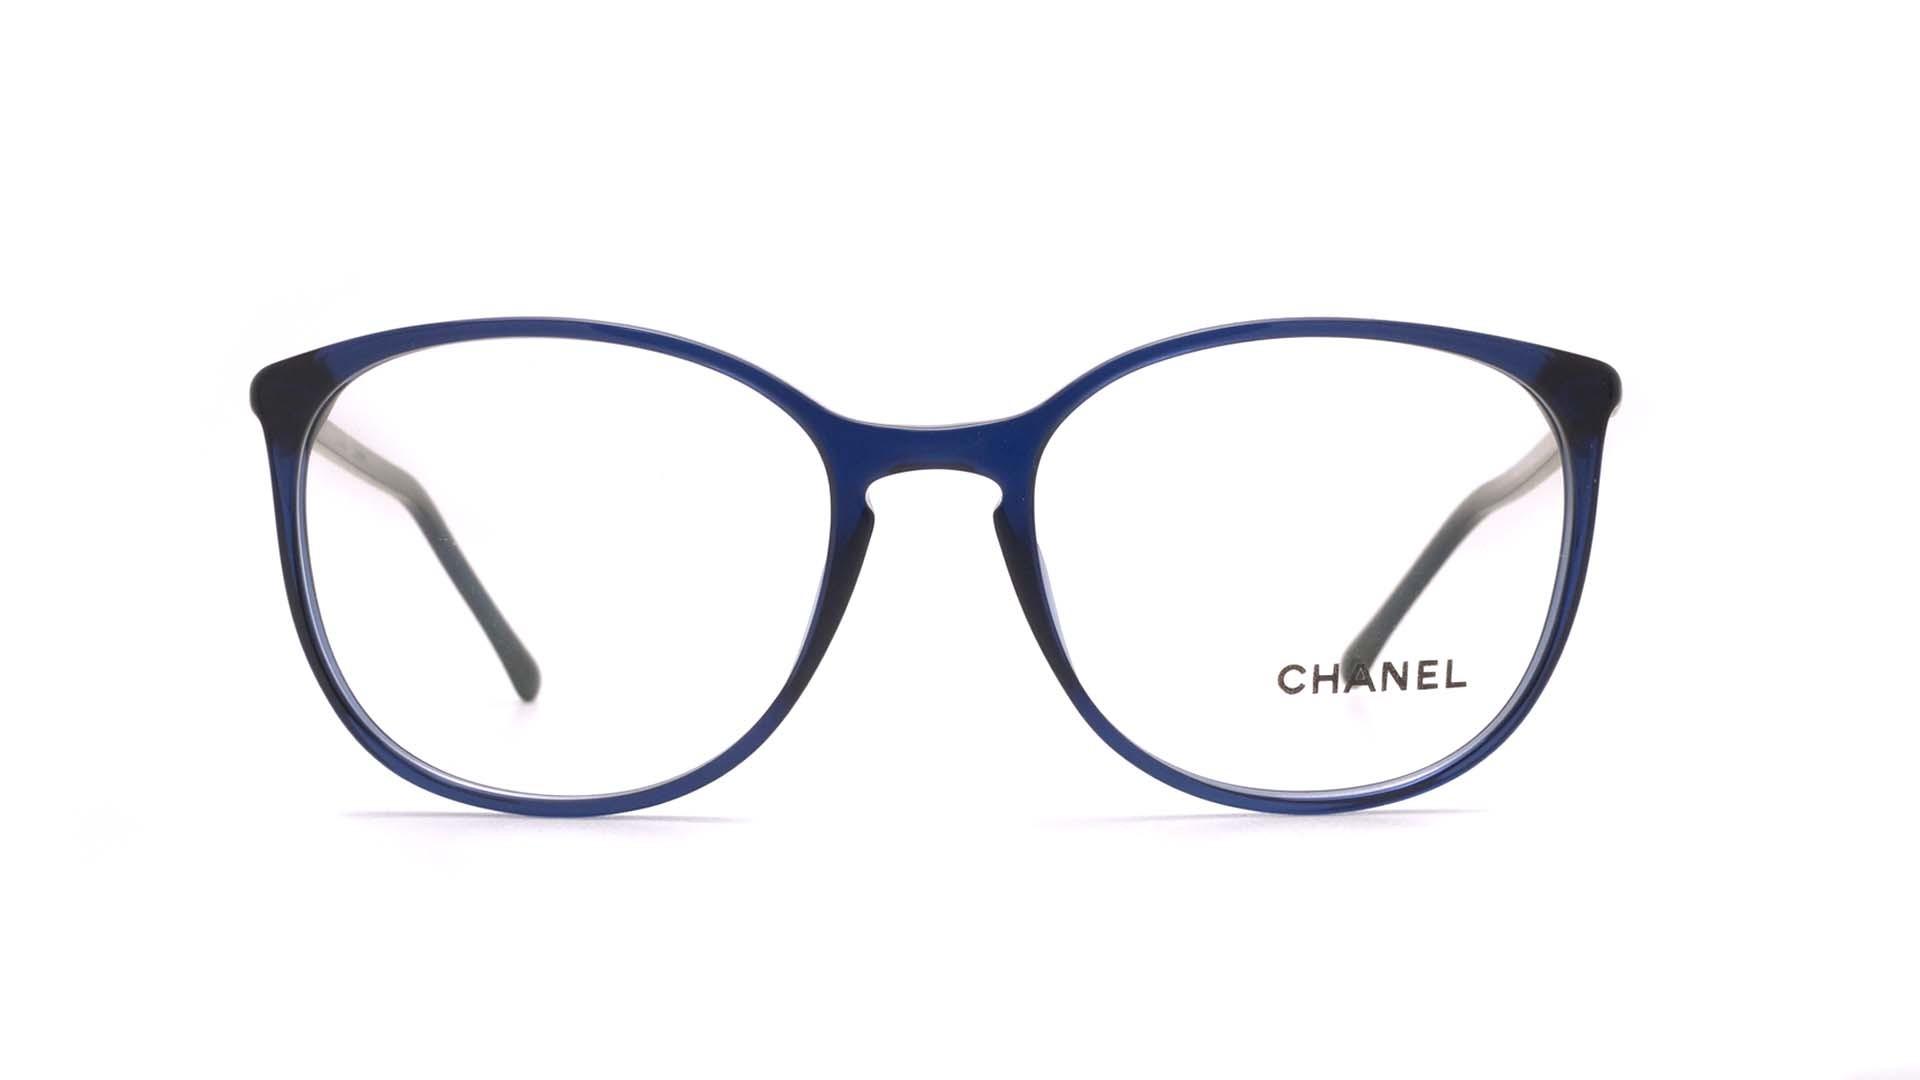 5c1119ef9d6 Eyeglasses Chanel Signature Blue CH3282 C503 54-18 Large